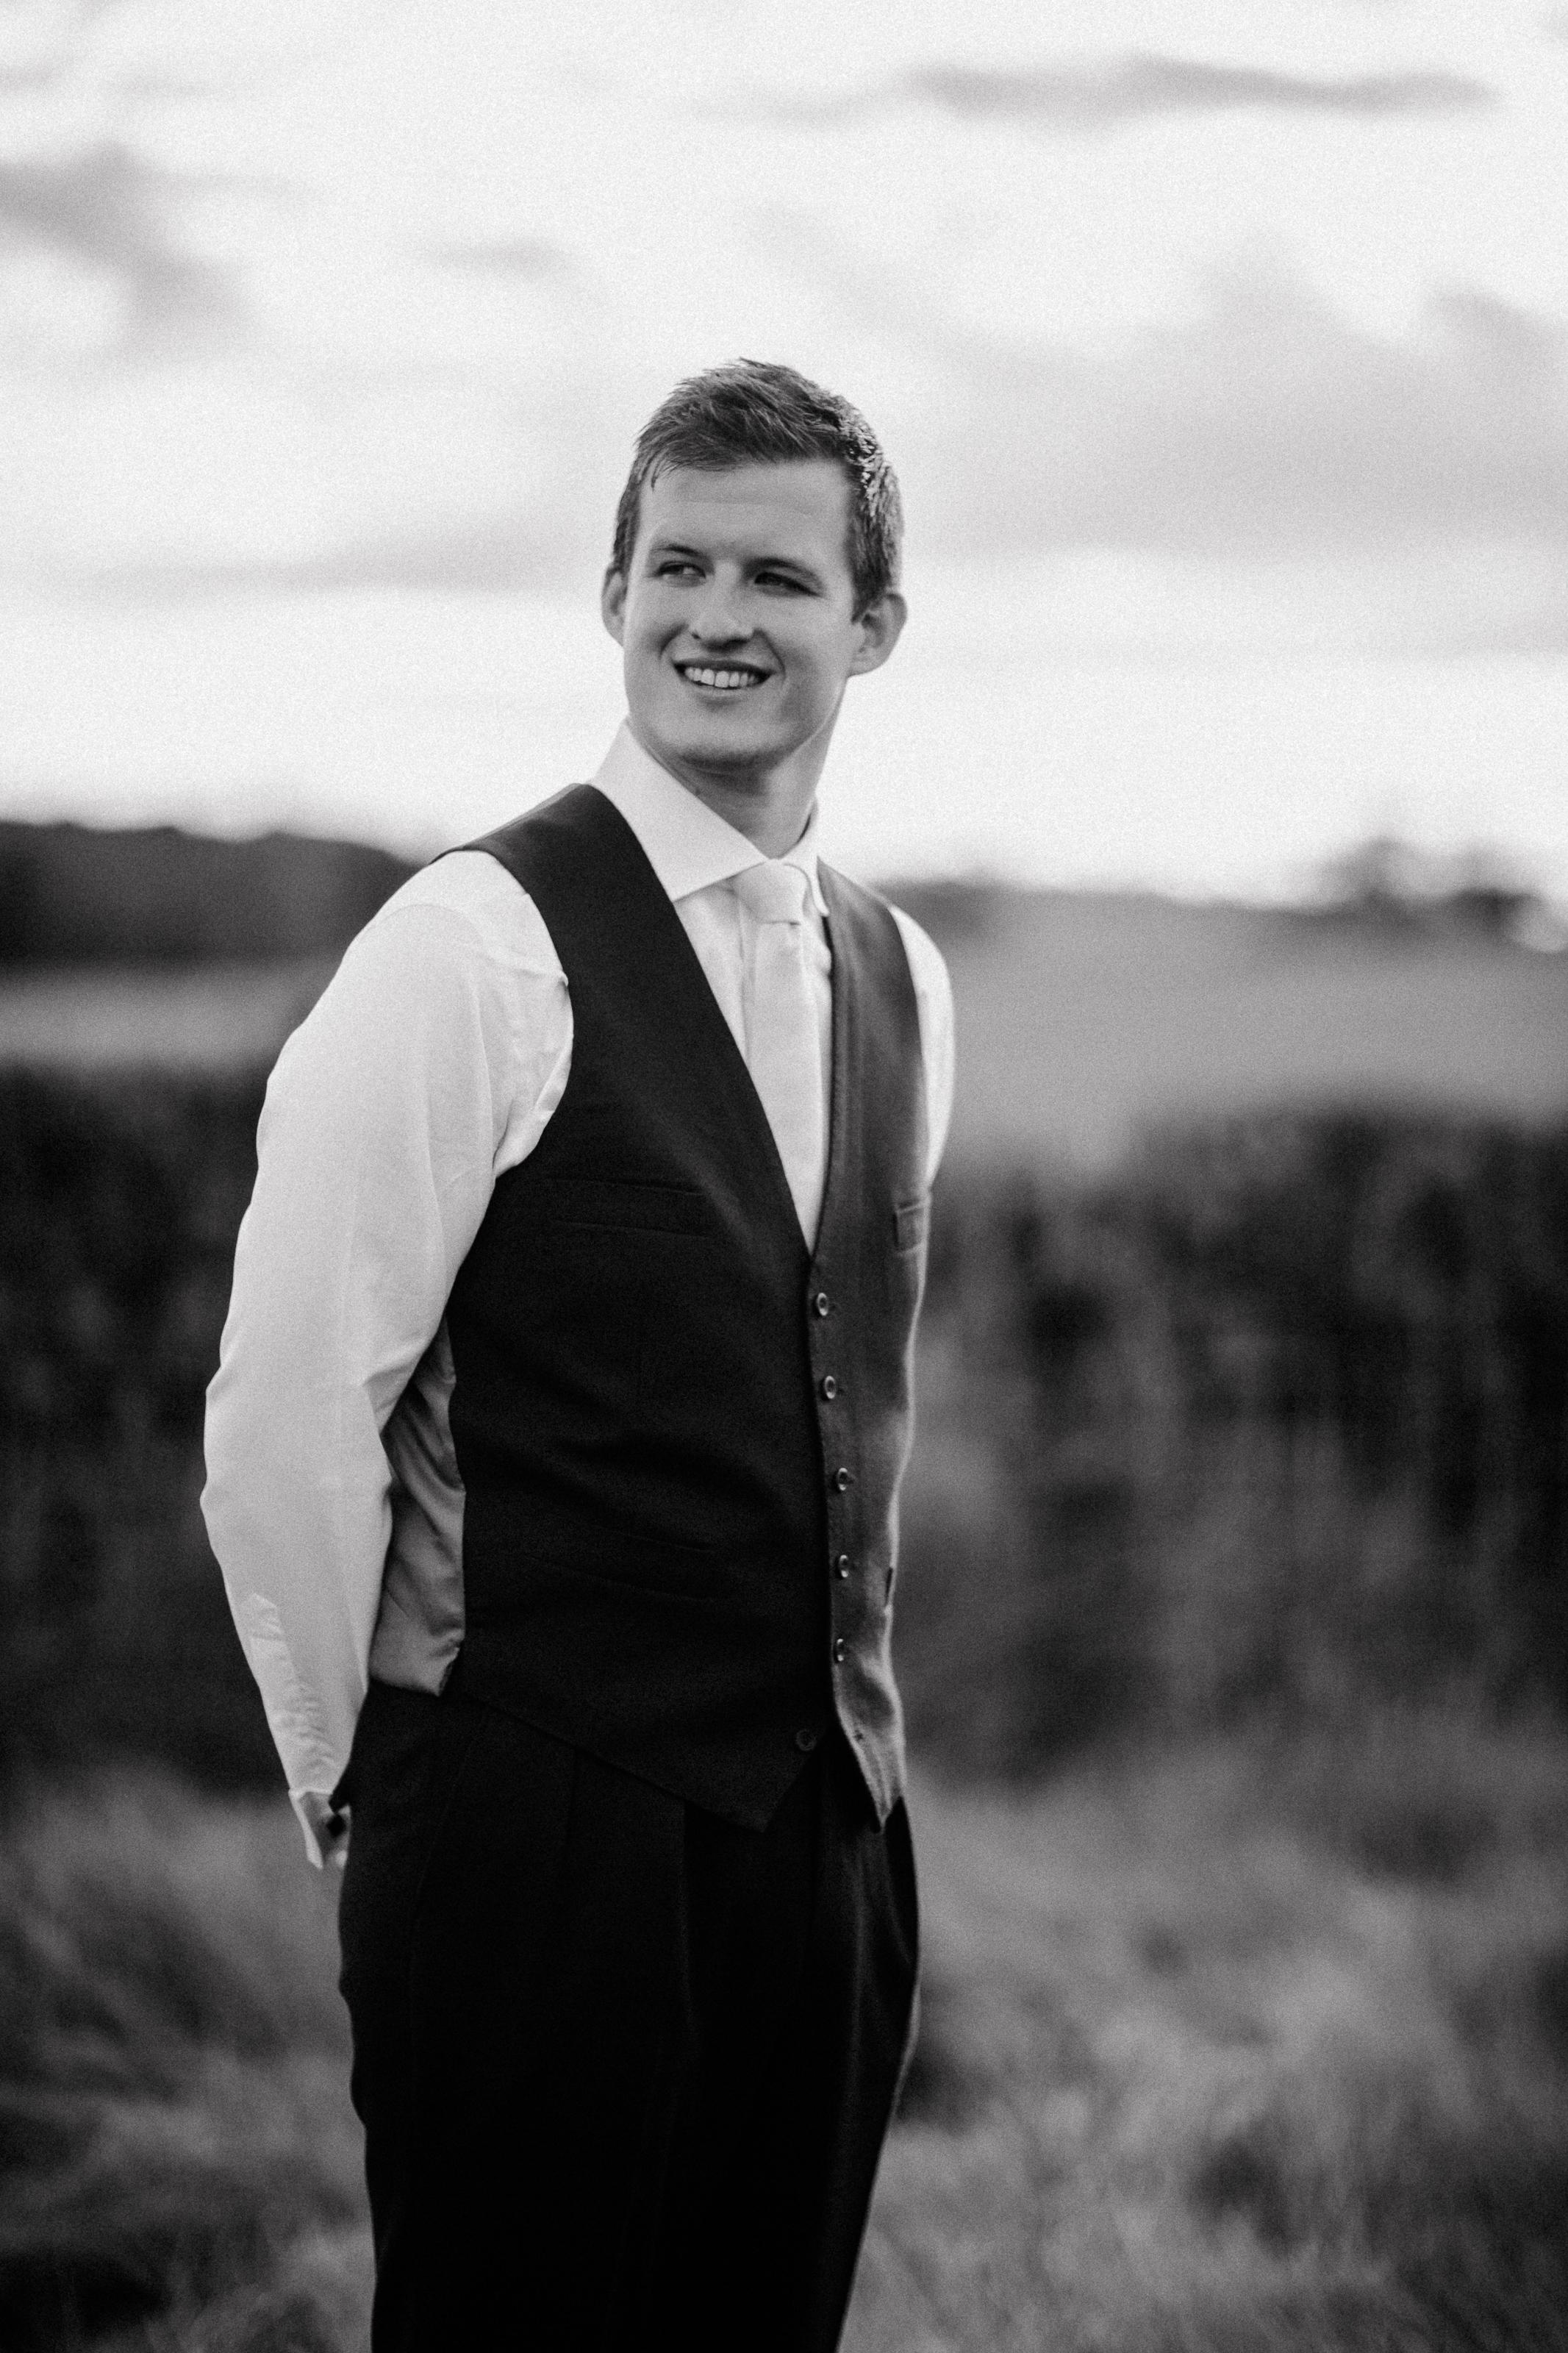 Wedding-Stockerston-Weddingphotographer-87.jpg